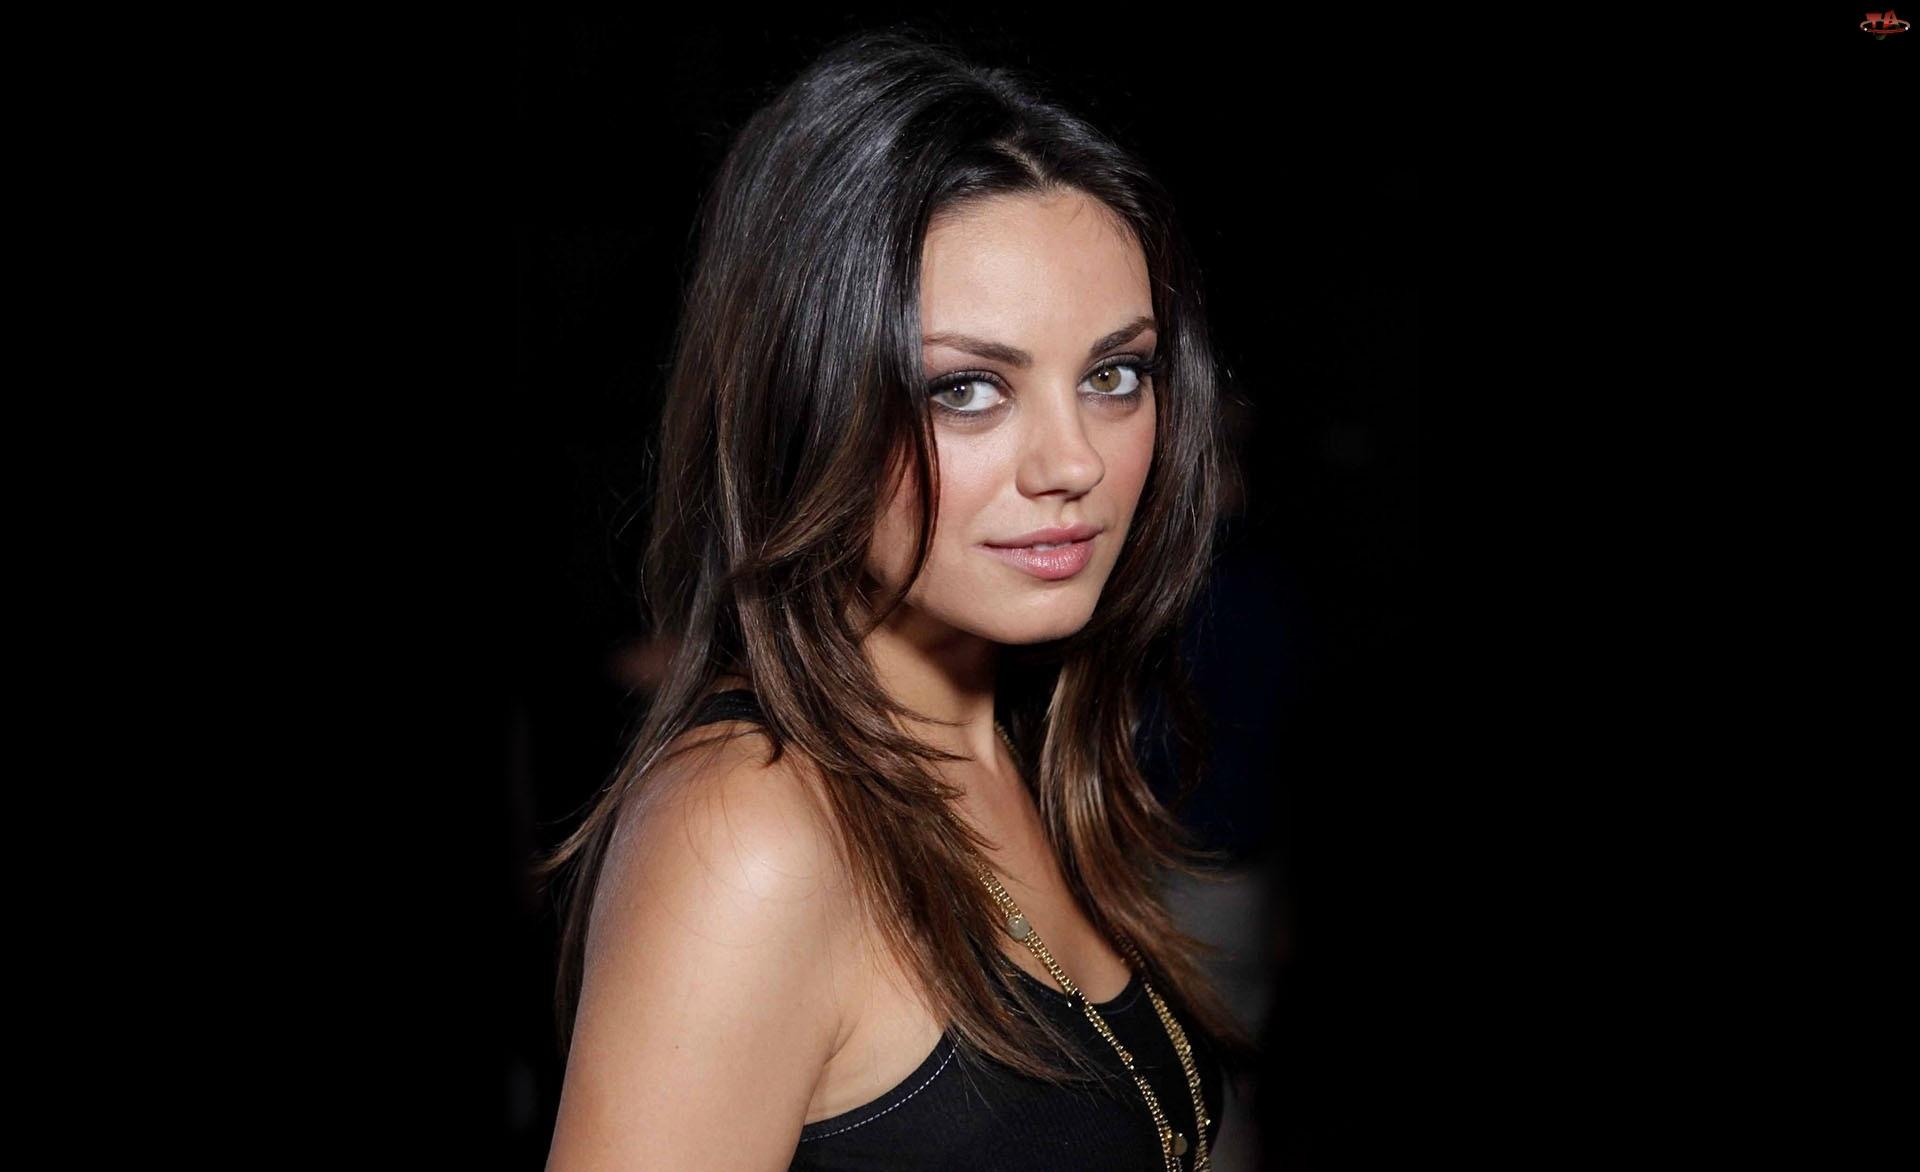 Mila Kunis, Aktorka